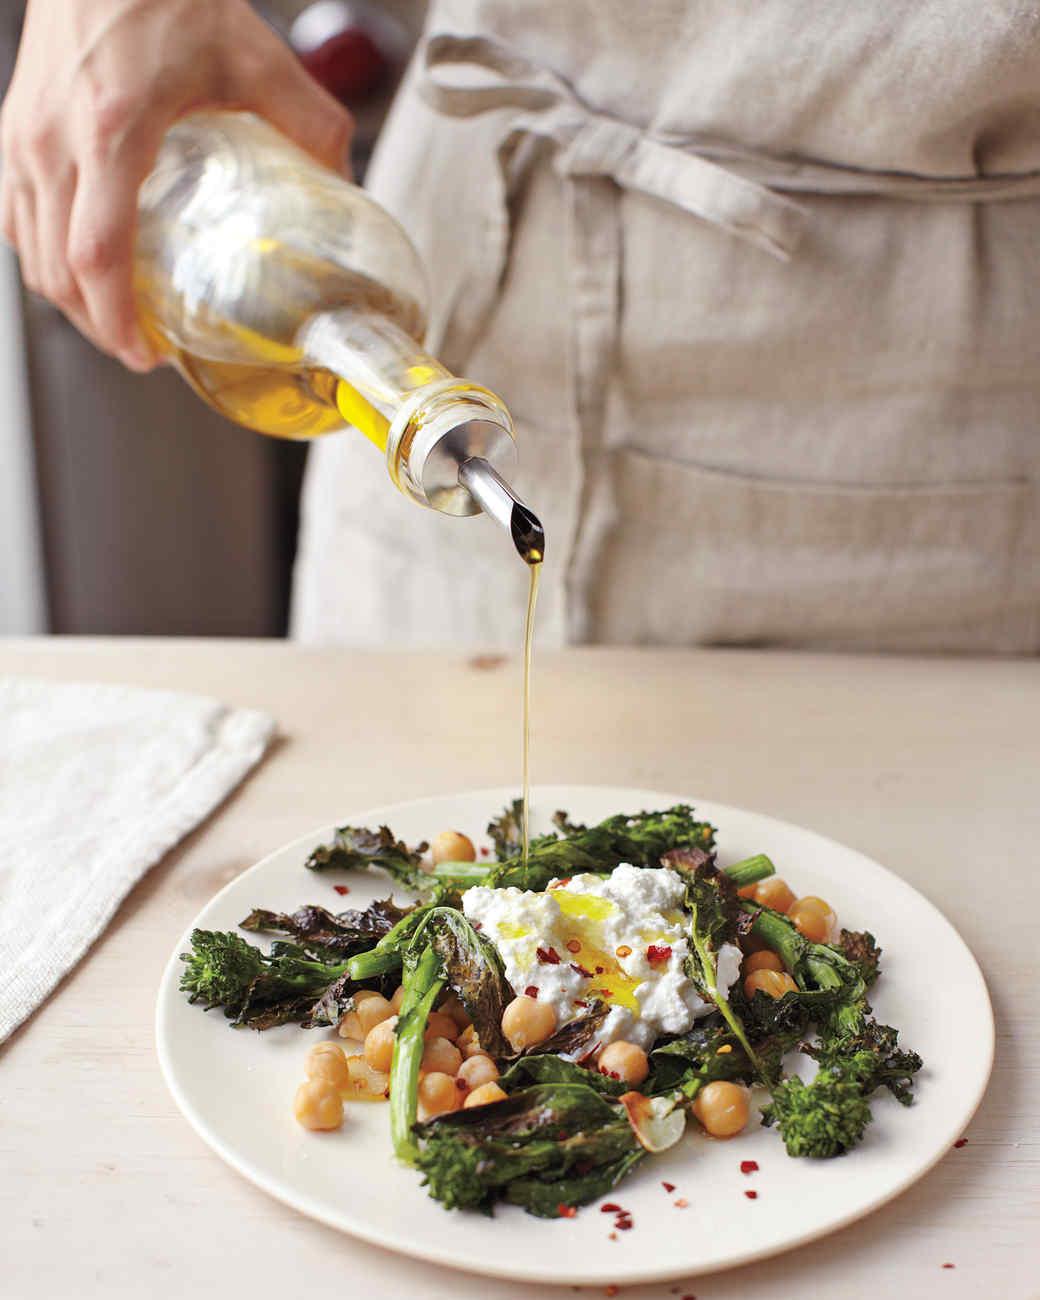 salad-broccolie-rabe-1011mbd107728.jpg